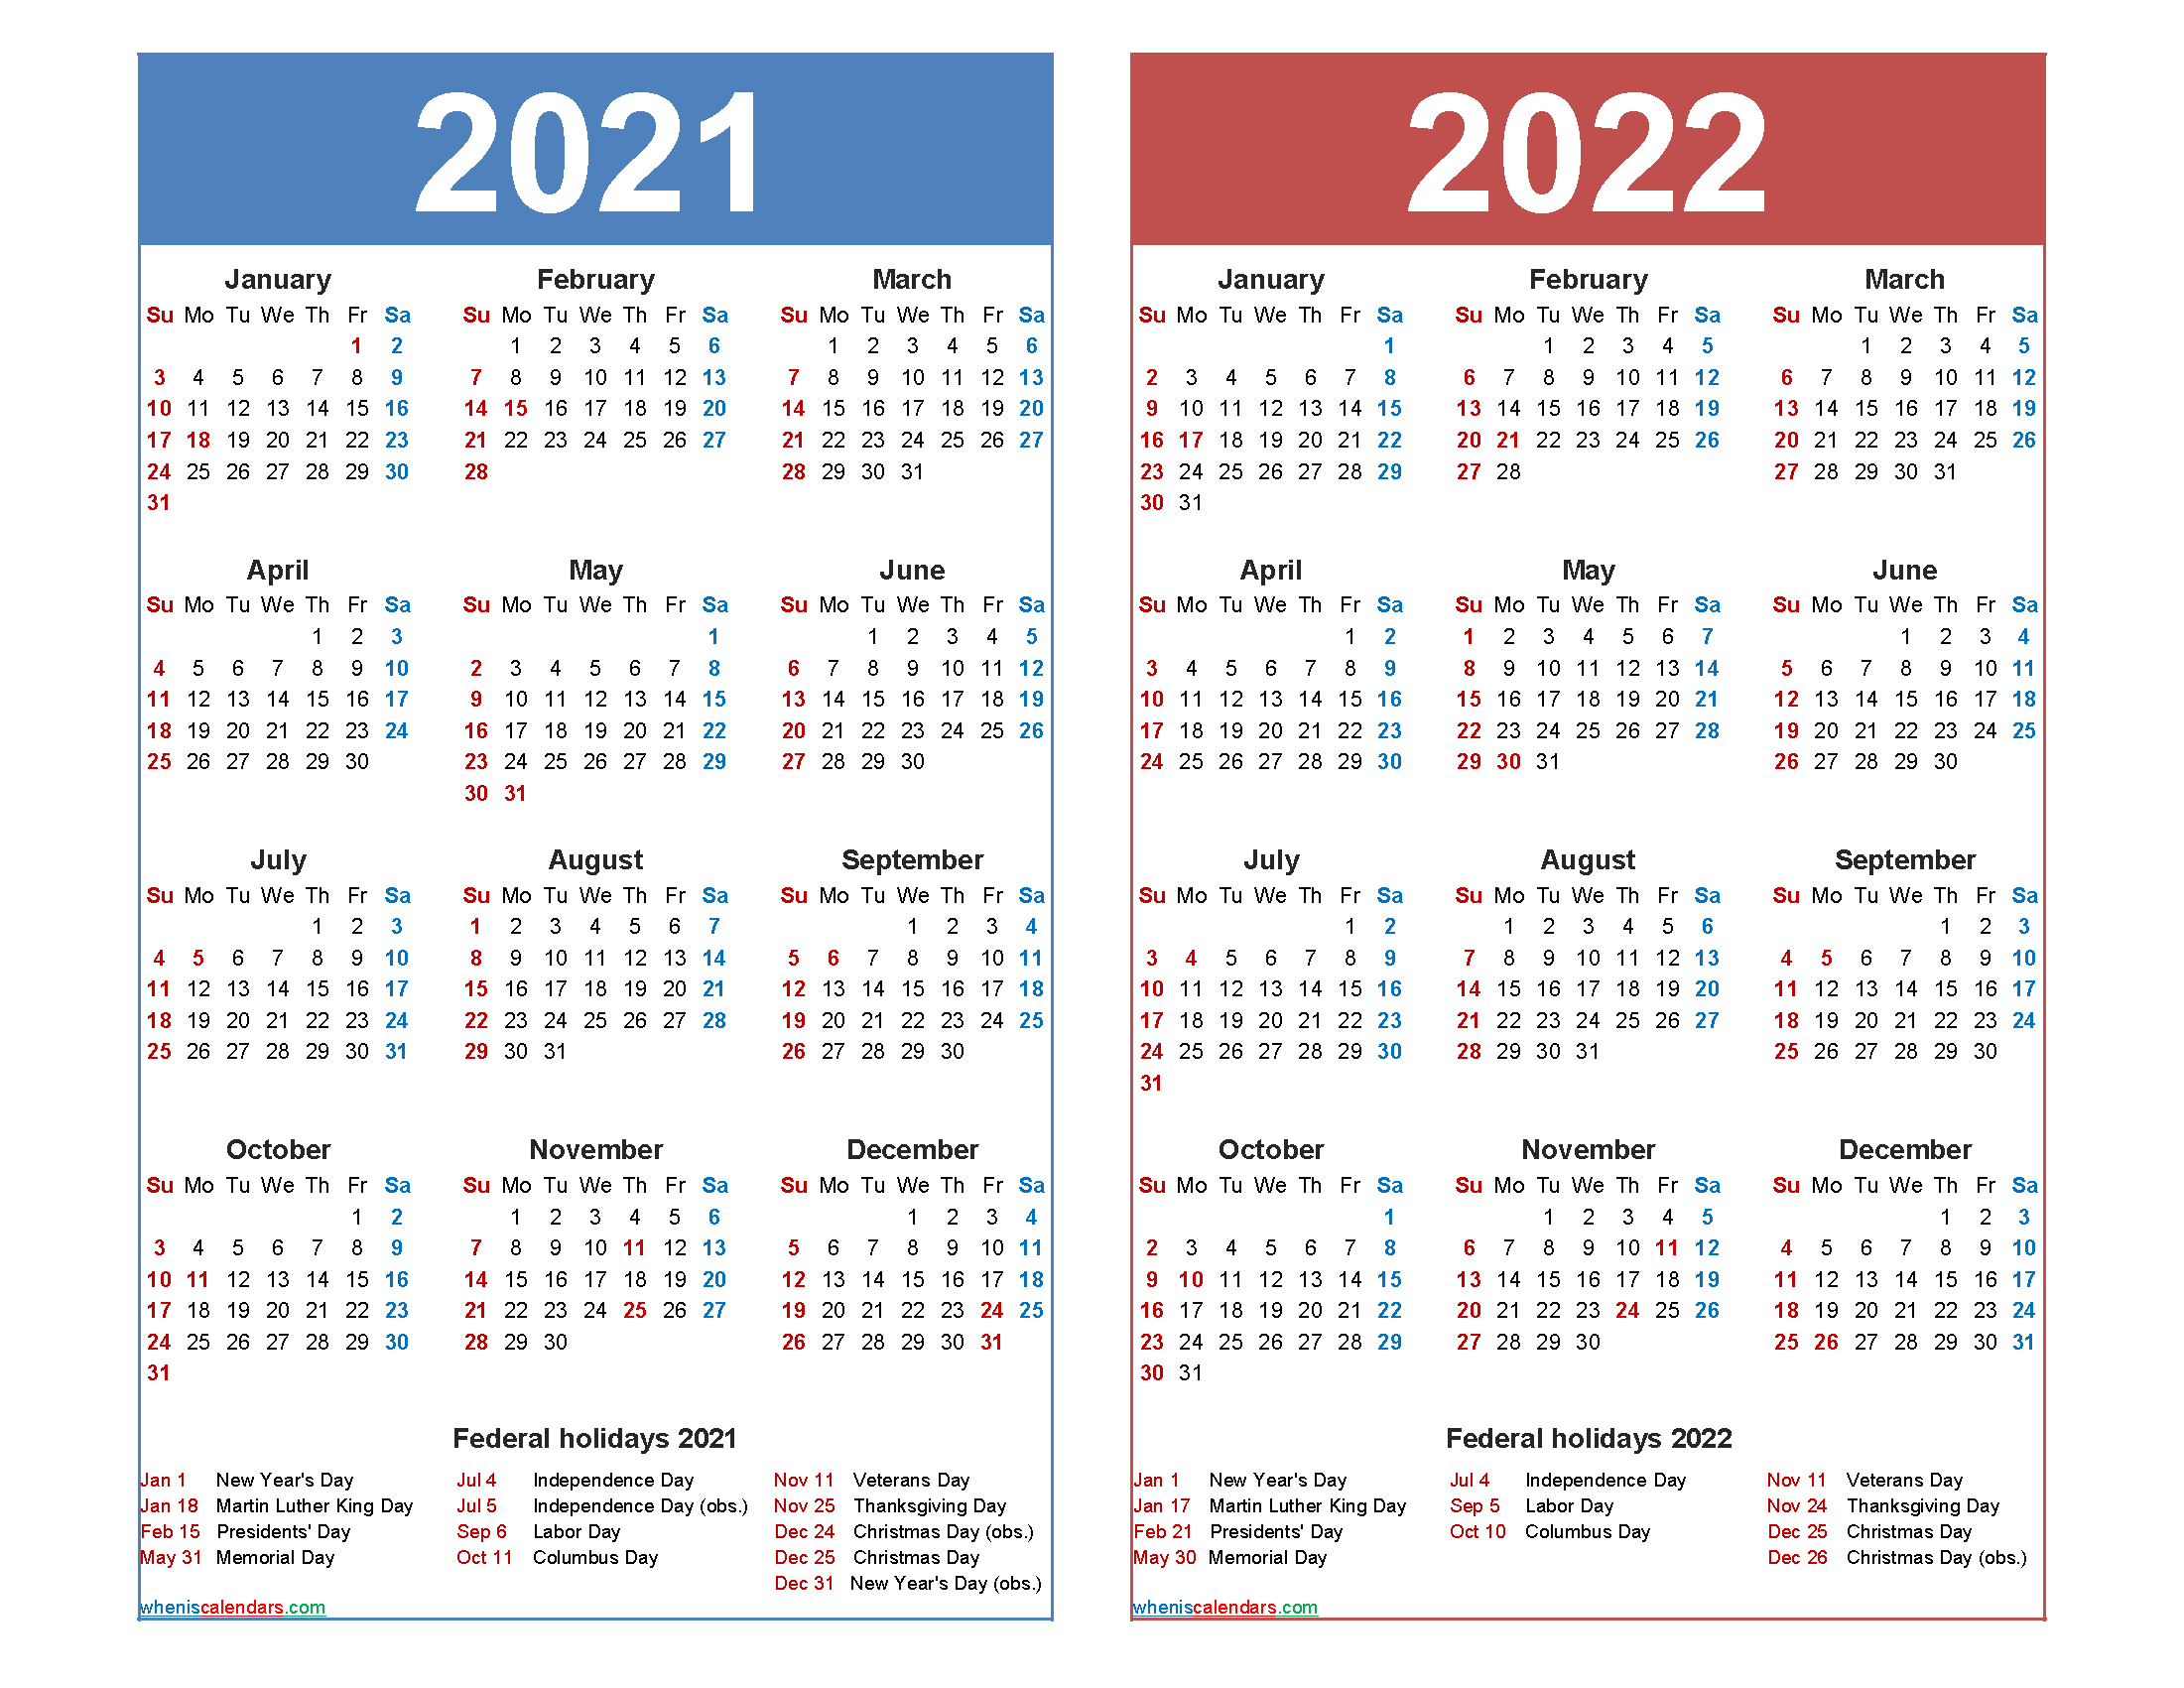 Free 2021 2022 Calendar Printable With Holidays - Free Printable 2021 Monthly Calendar With Holidays